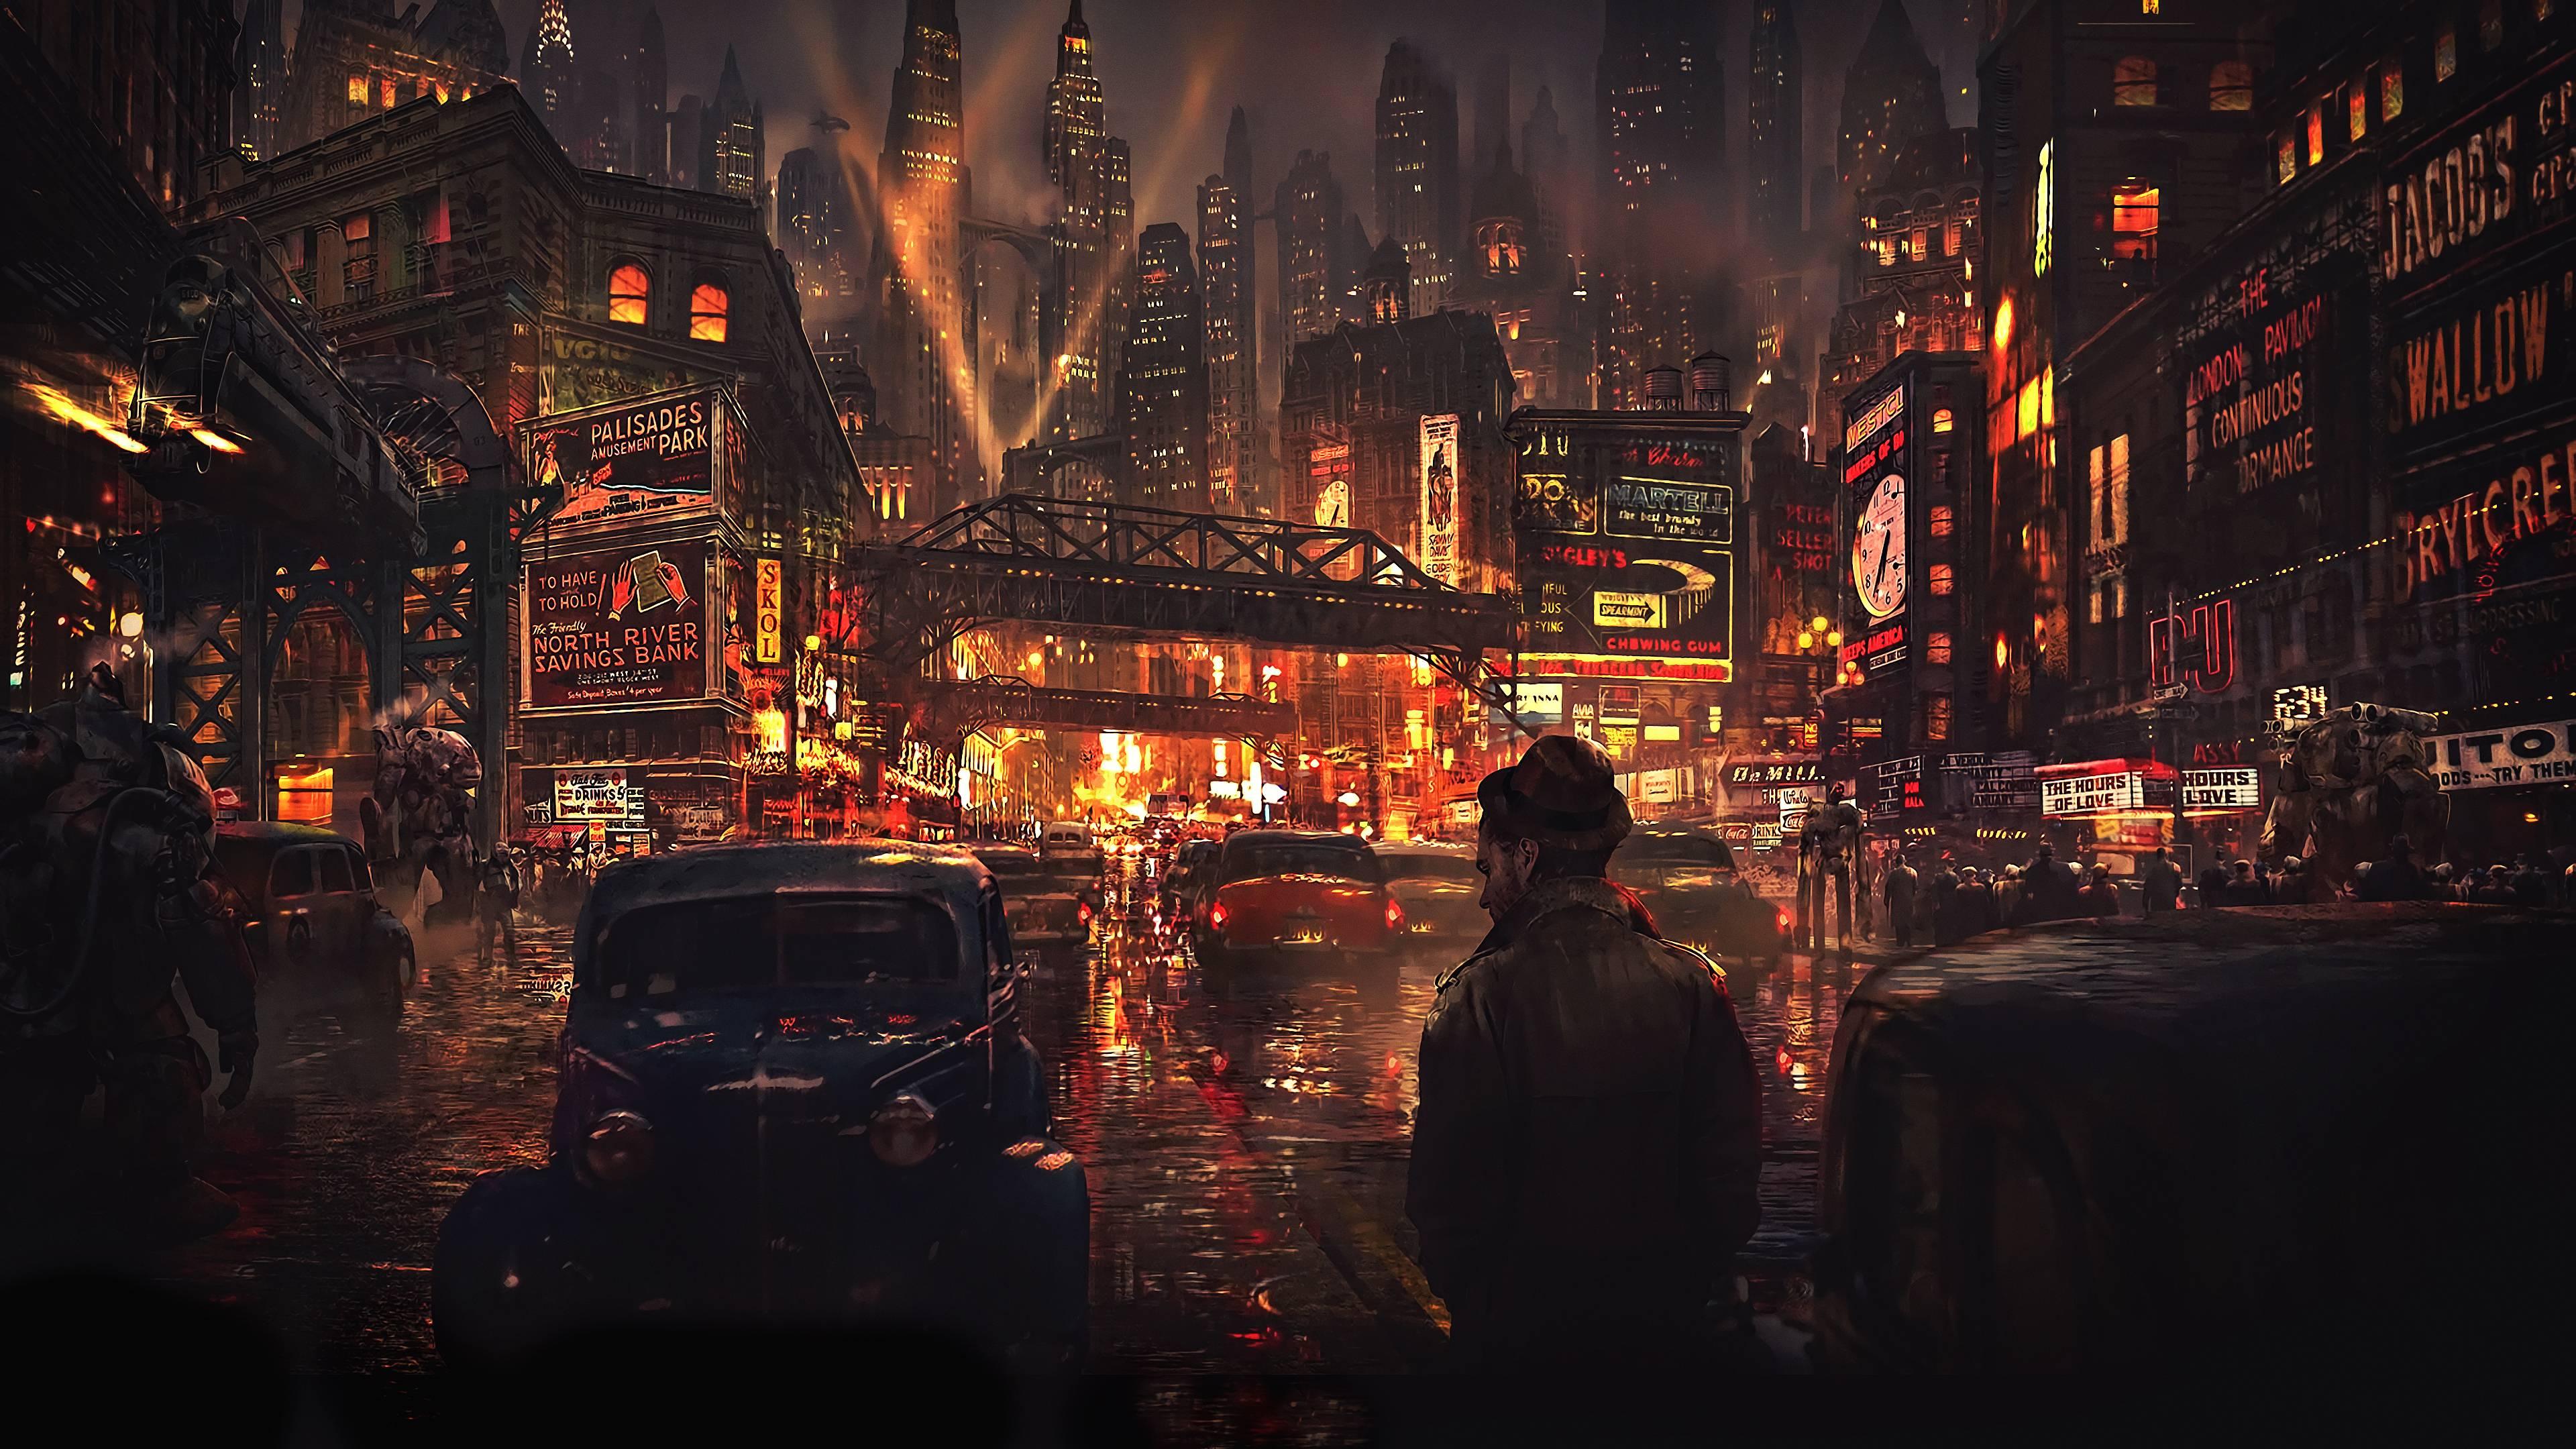 Dystopian Wallpaper Dump   Album on Imgur 3840x2160